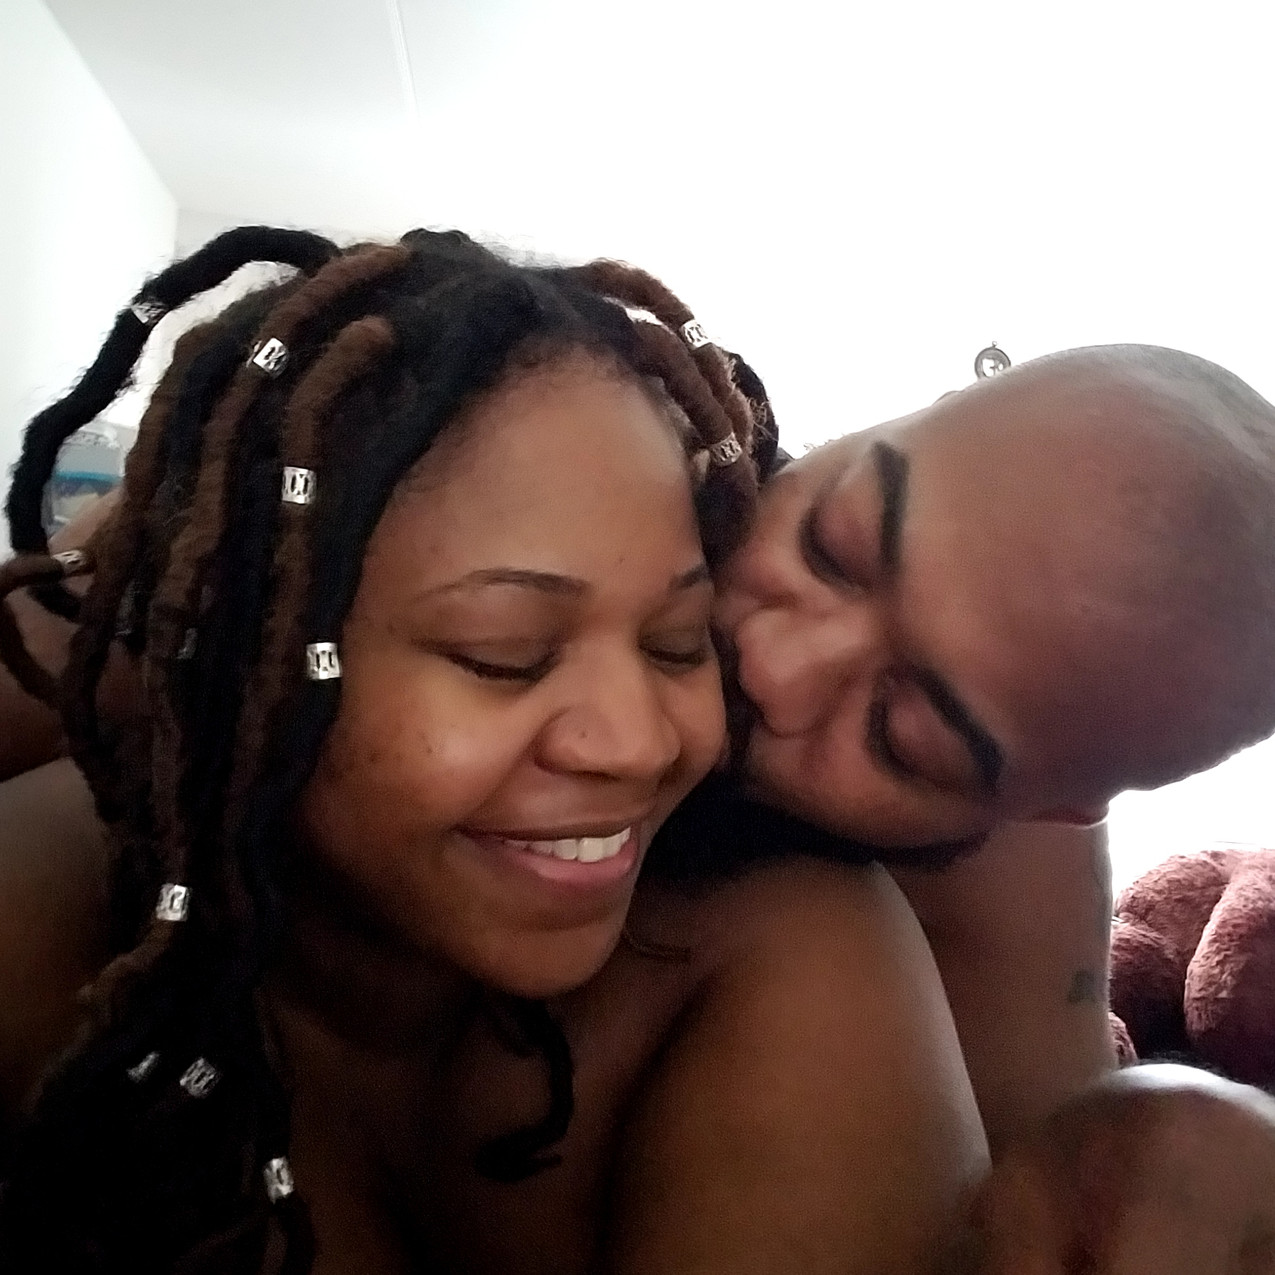 Sweet Love Making #RodandShy